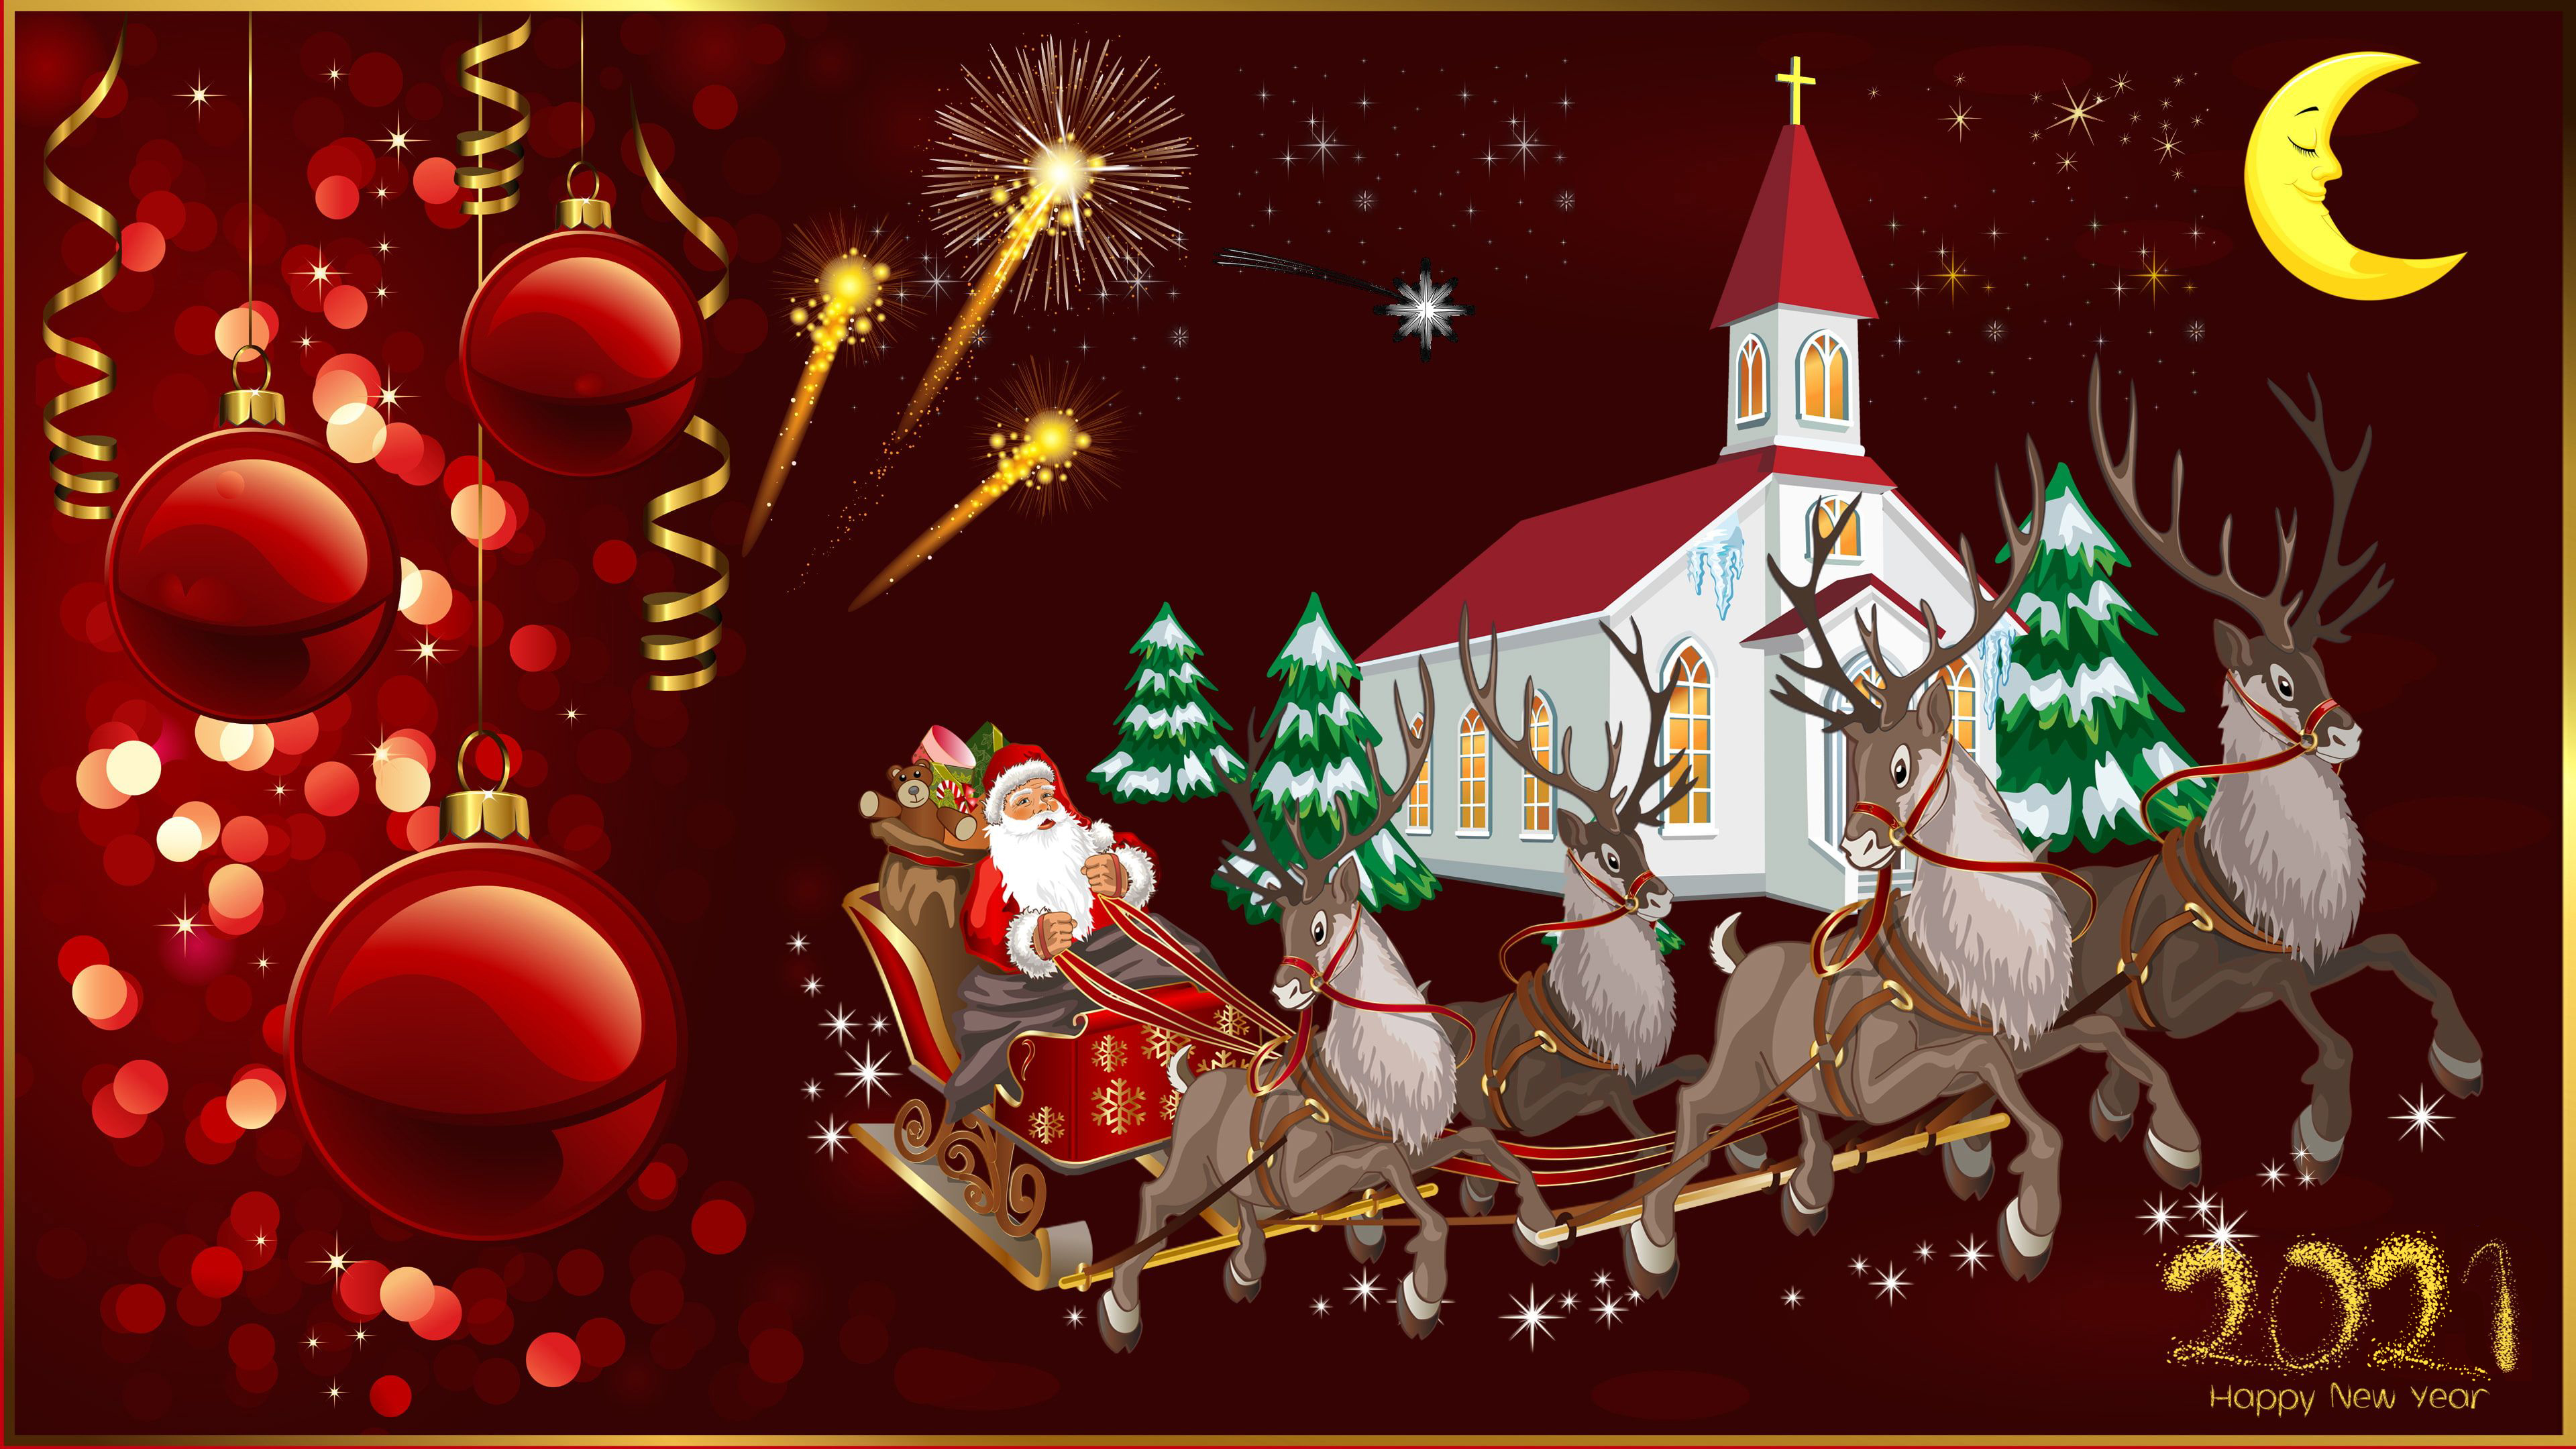 Happy New Year 2021 Merry Christmas Christmas Greeting Card Santa 3840x2160